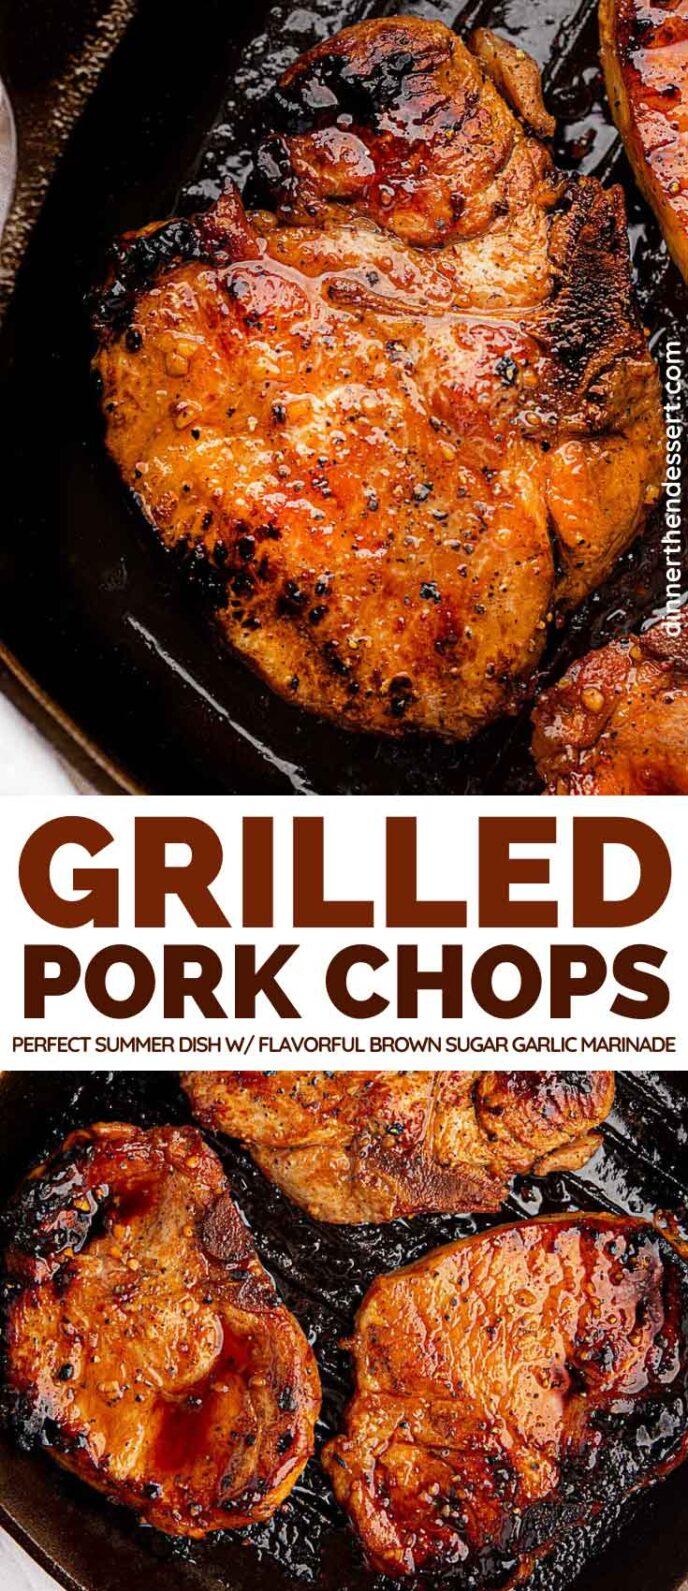 Grilled Pork Chops collage